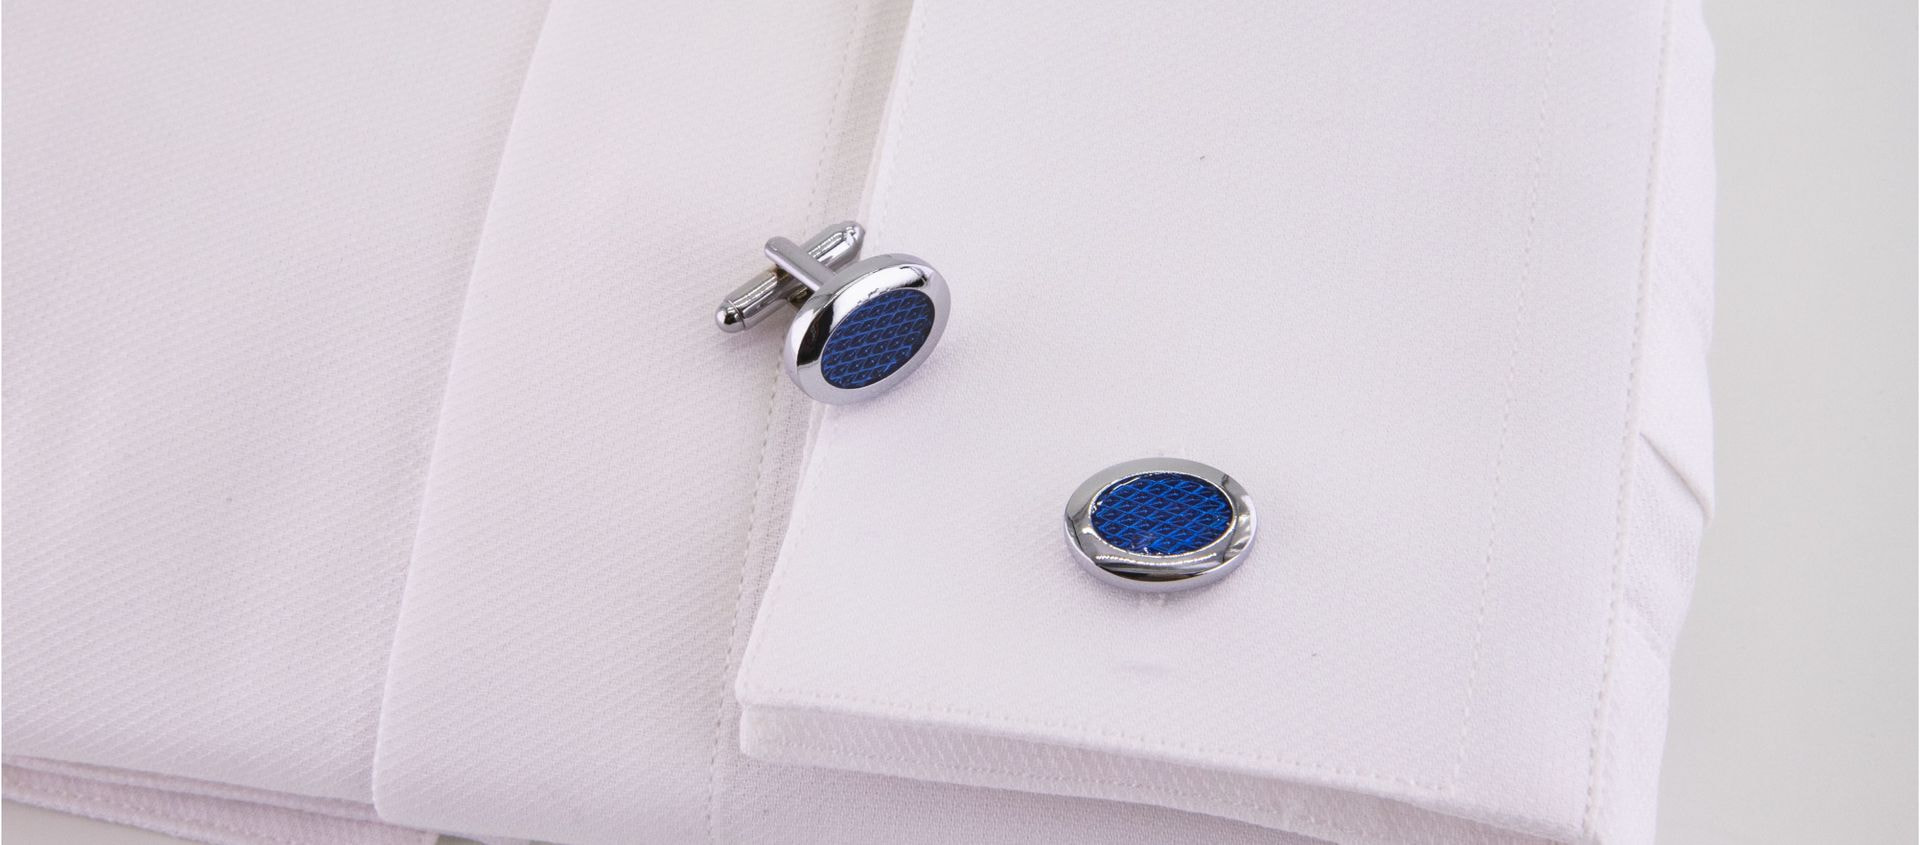 gemelli ovali blu e acciaio